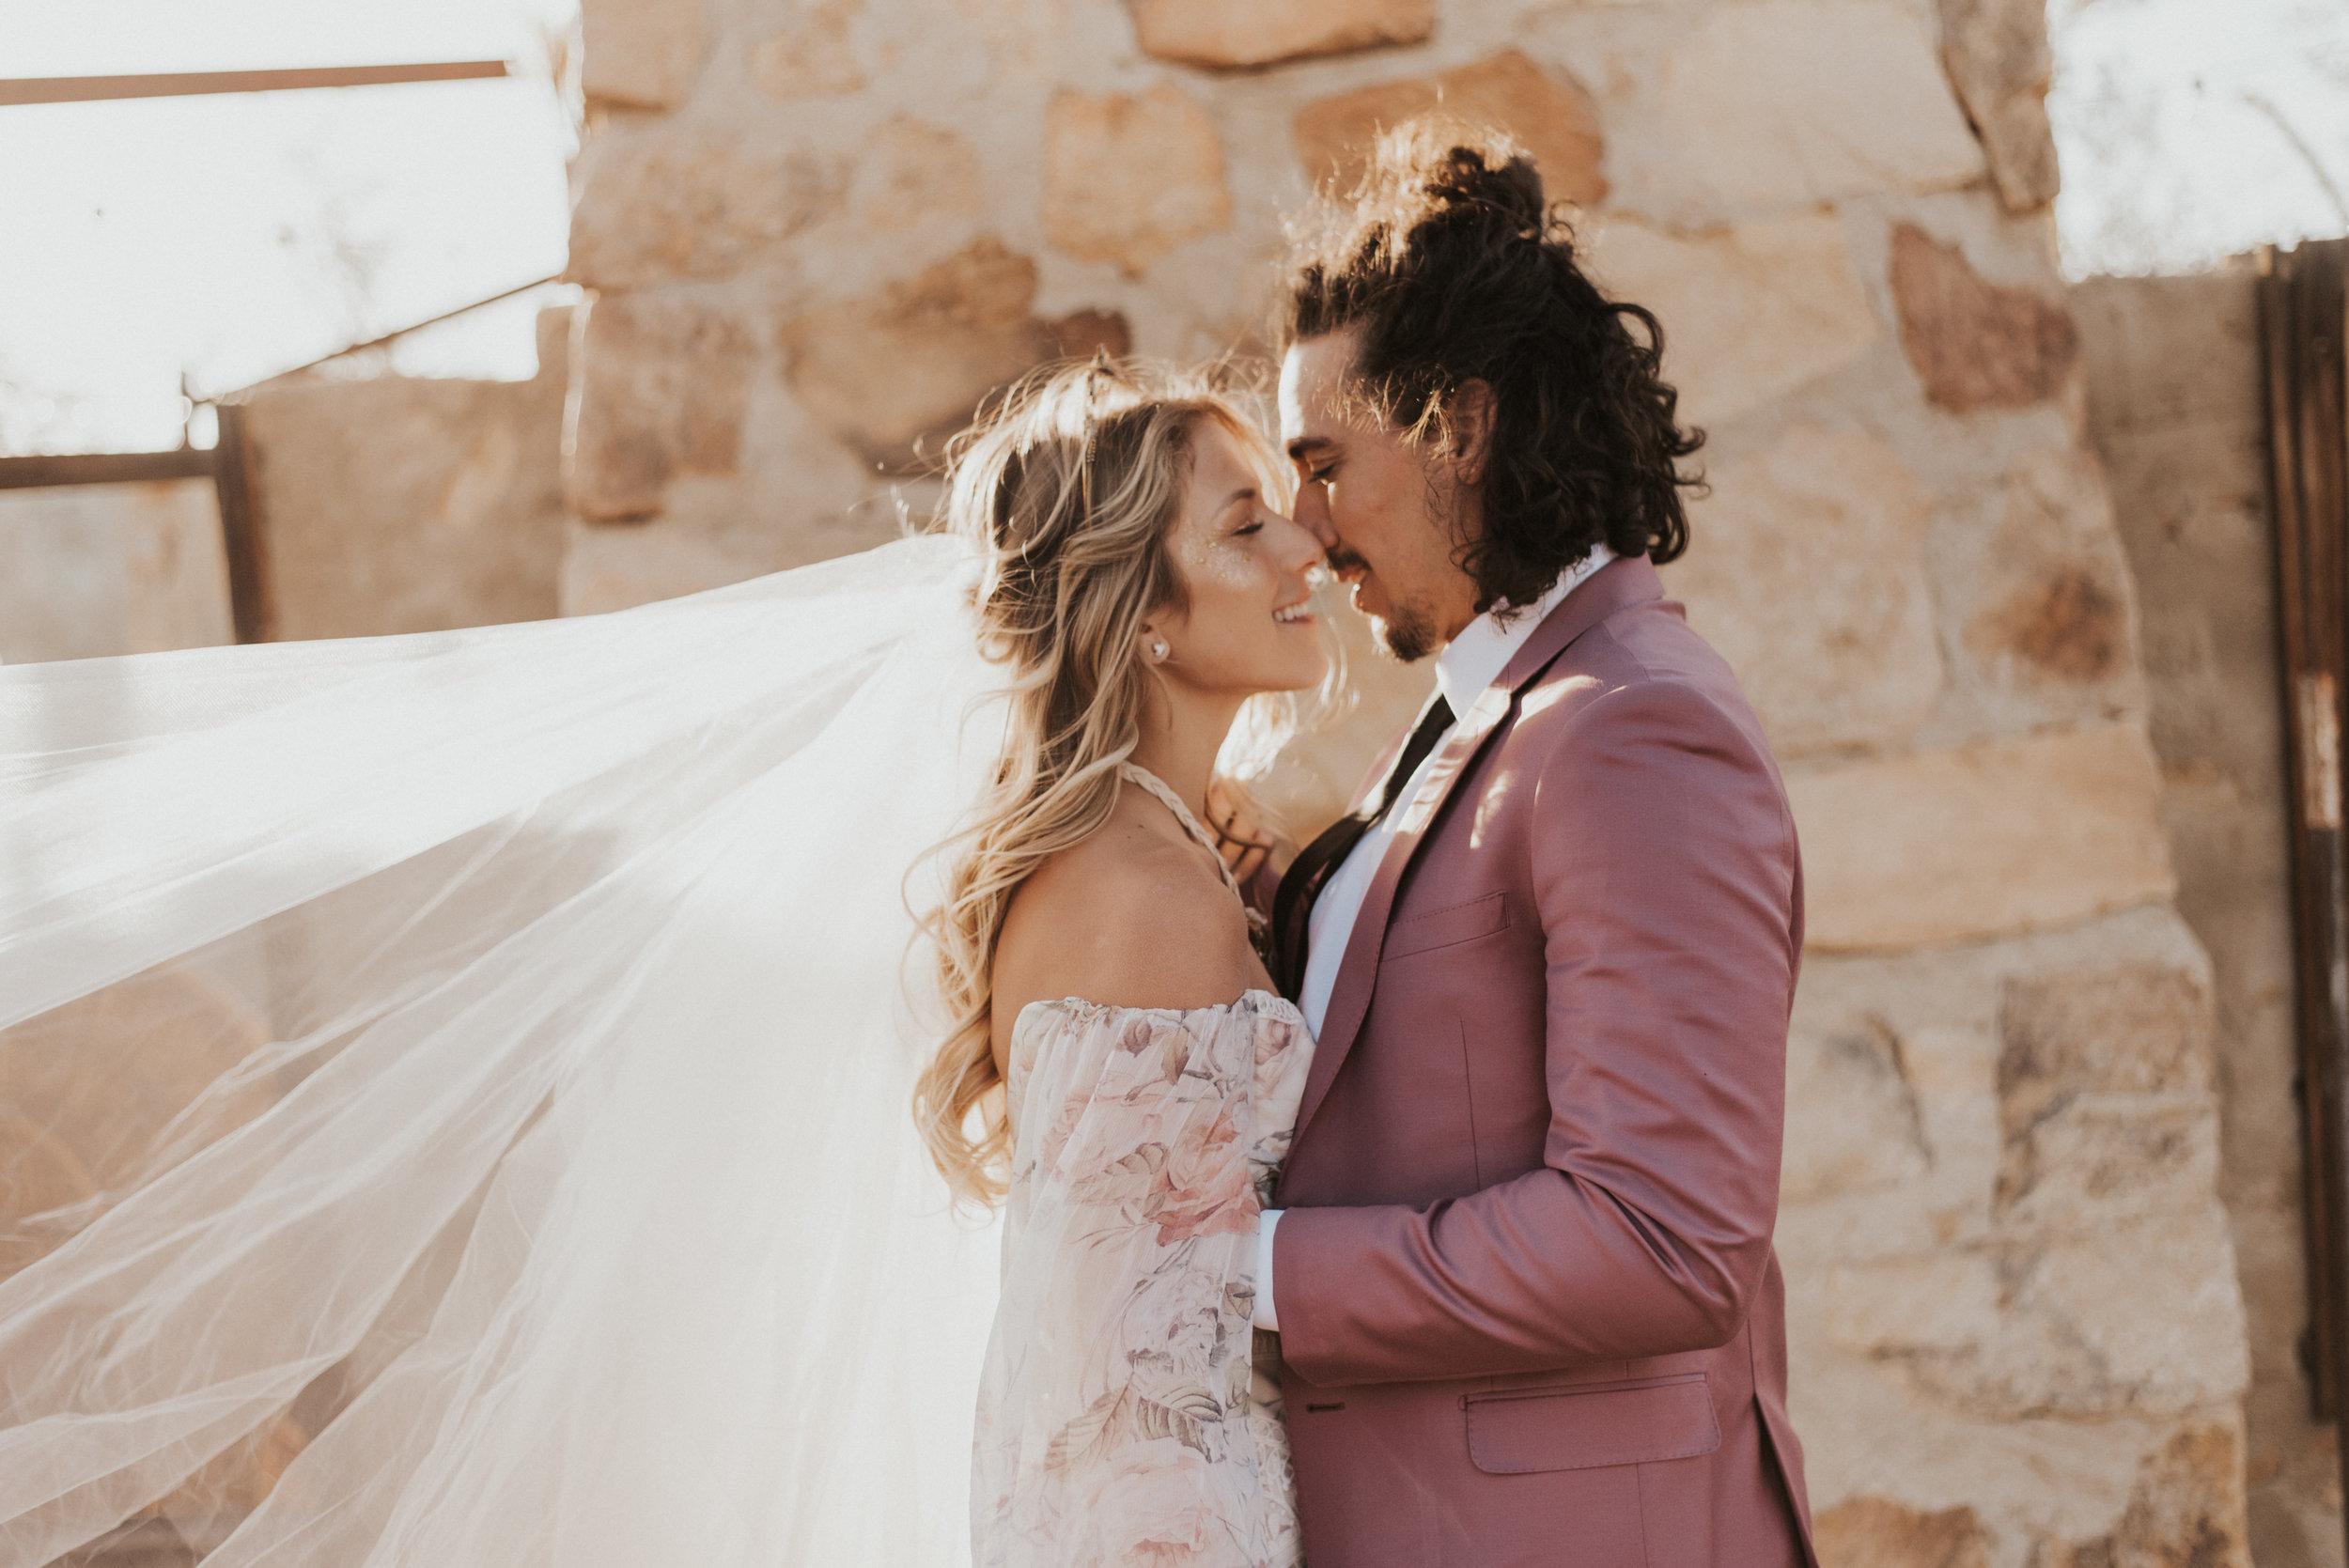 FortSt.John_photographer_TyraEPhotography_Wedding_Couple_Family_Photograhy_DawsonCreek_Elopement_Bride_Boduoir_Portraits-7917.jpg